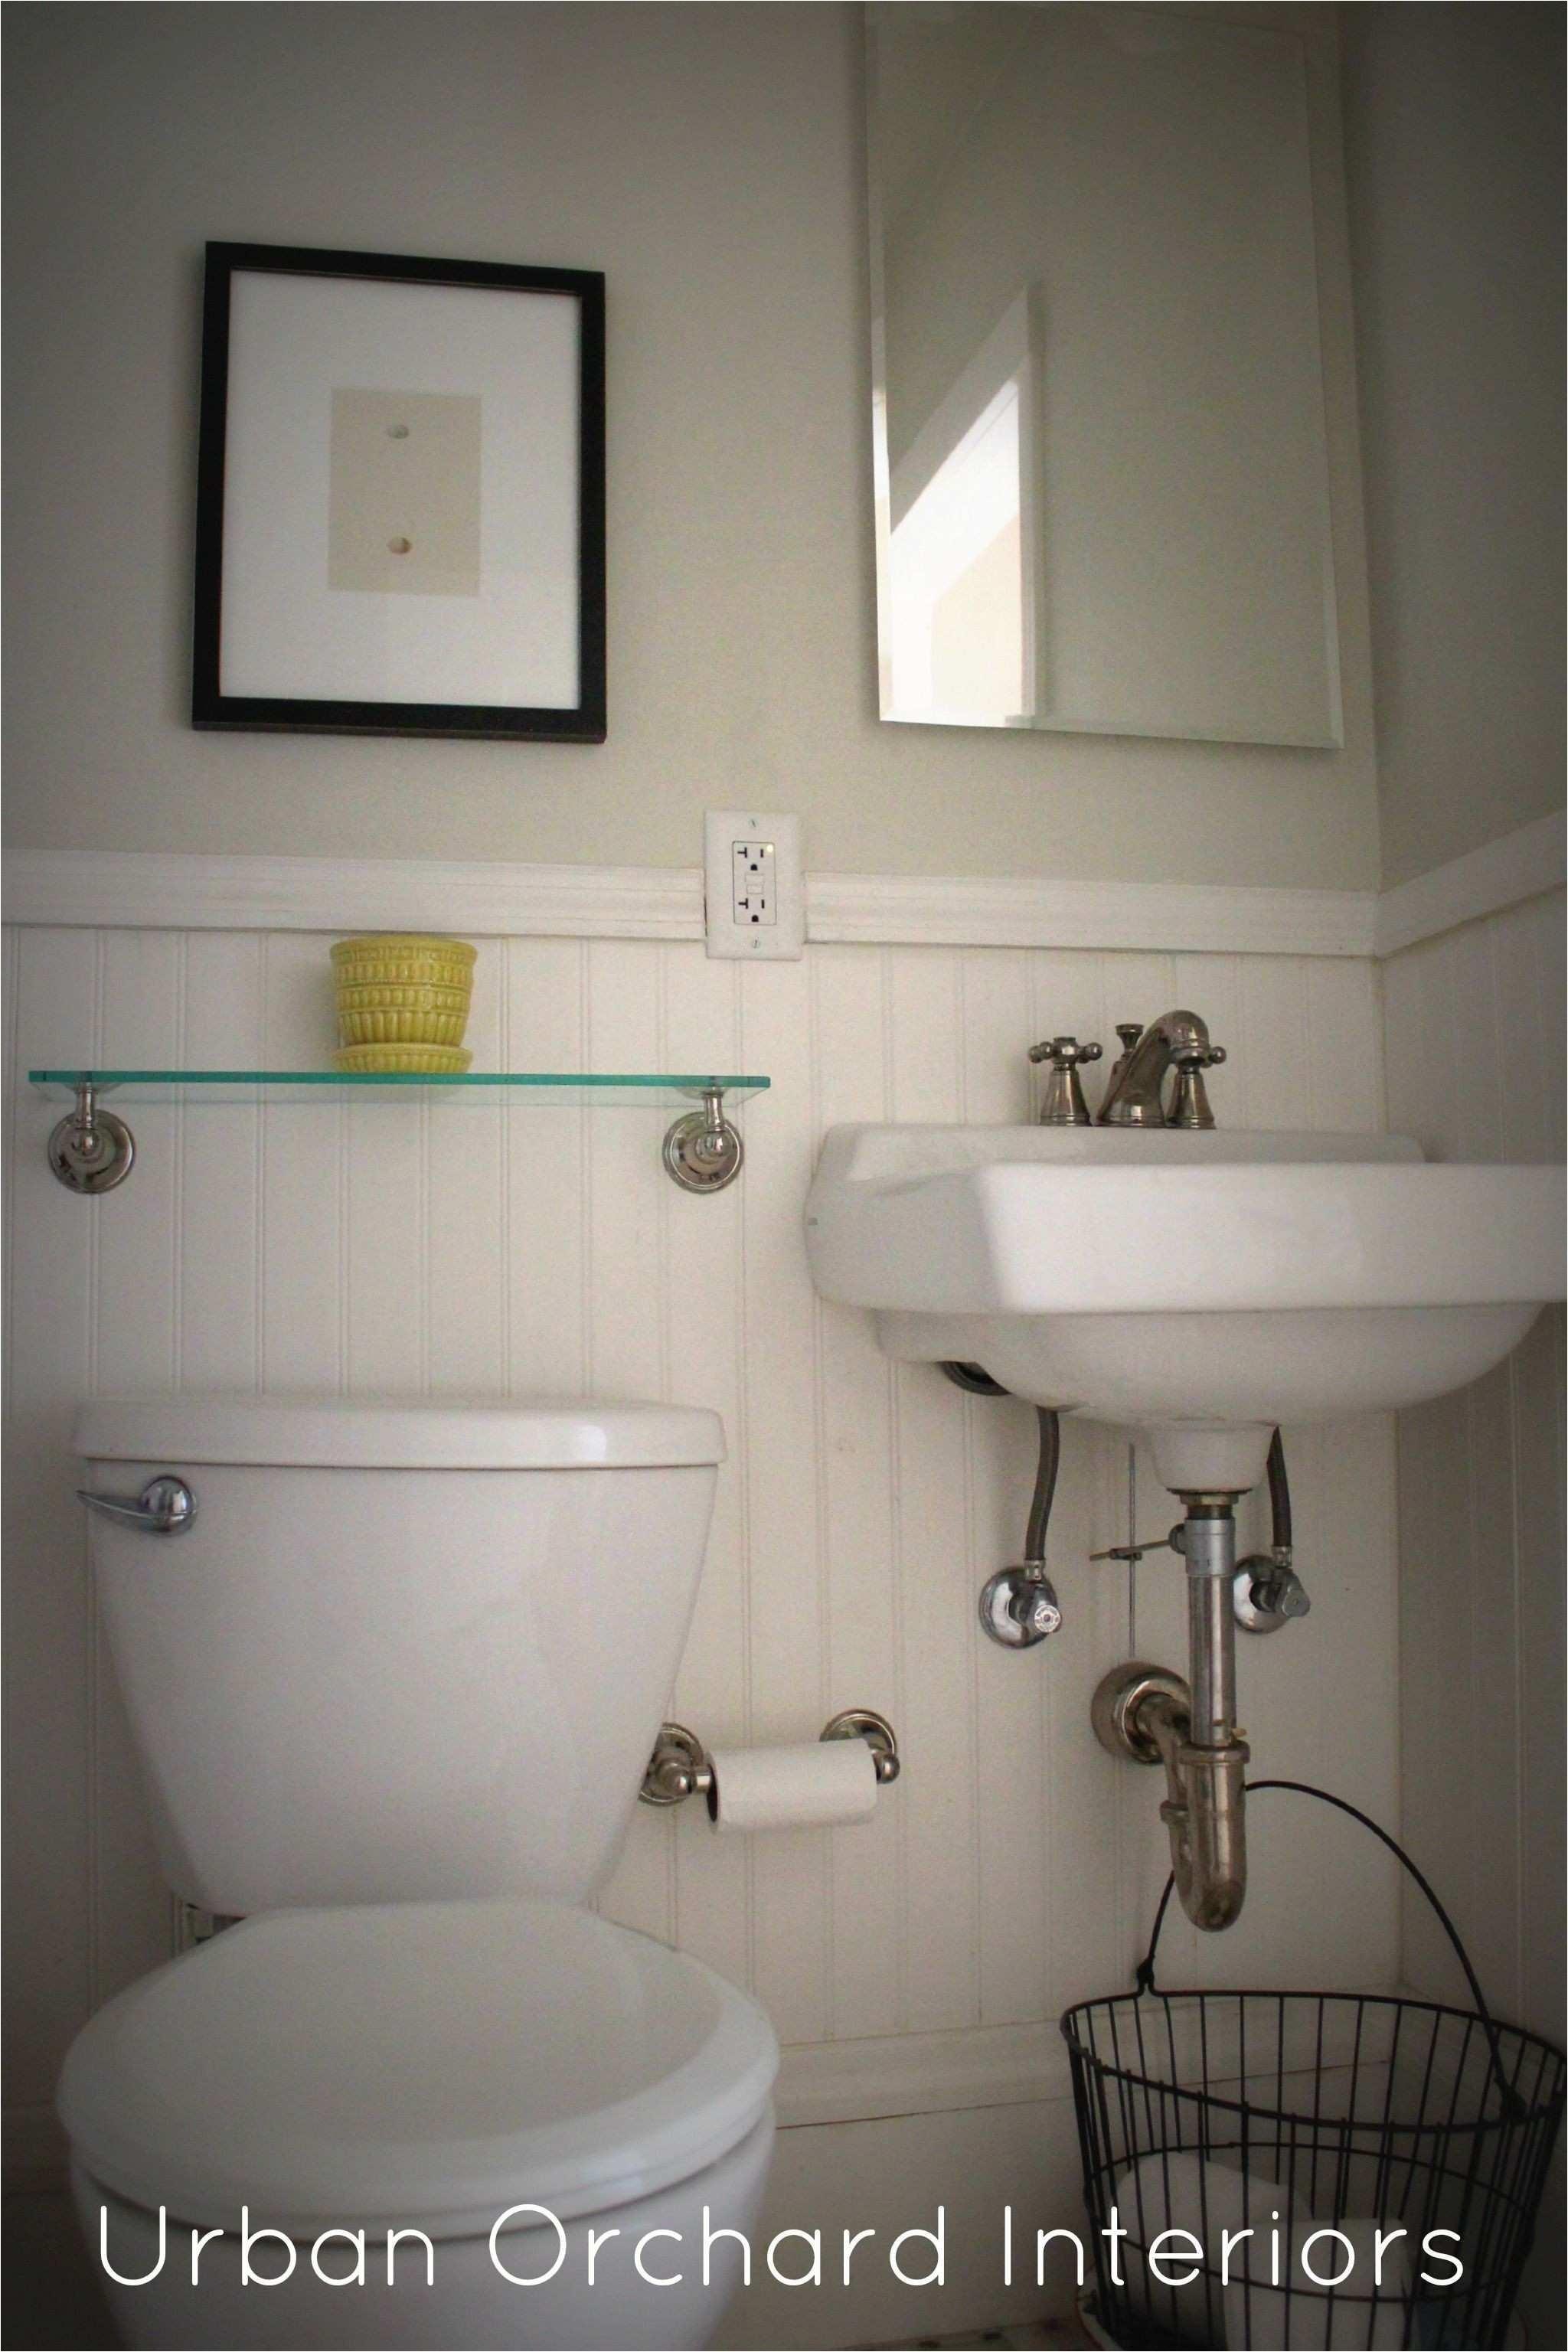 New Home Bathroom Designs Cheap Wainscoting Awesome Shelves Bar New Wainscoting Shelf 0d Pics New